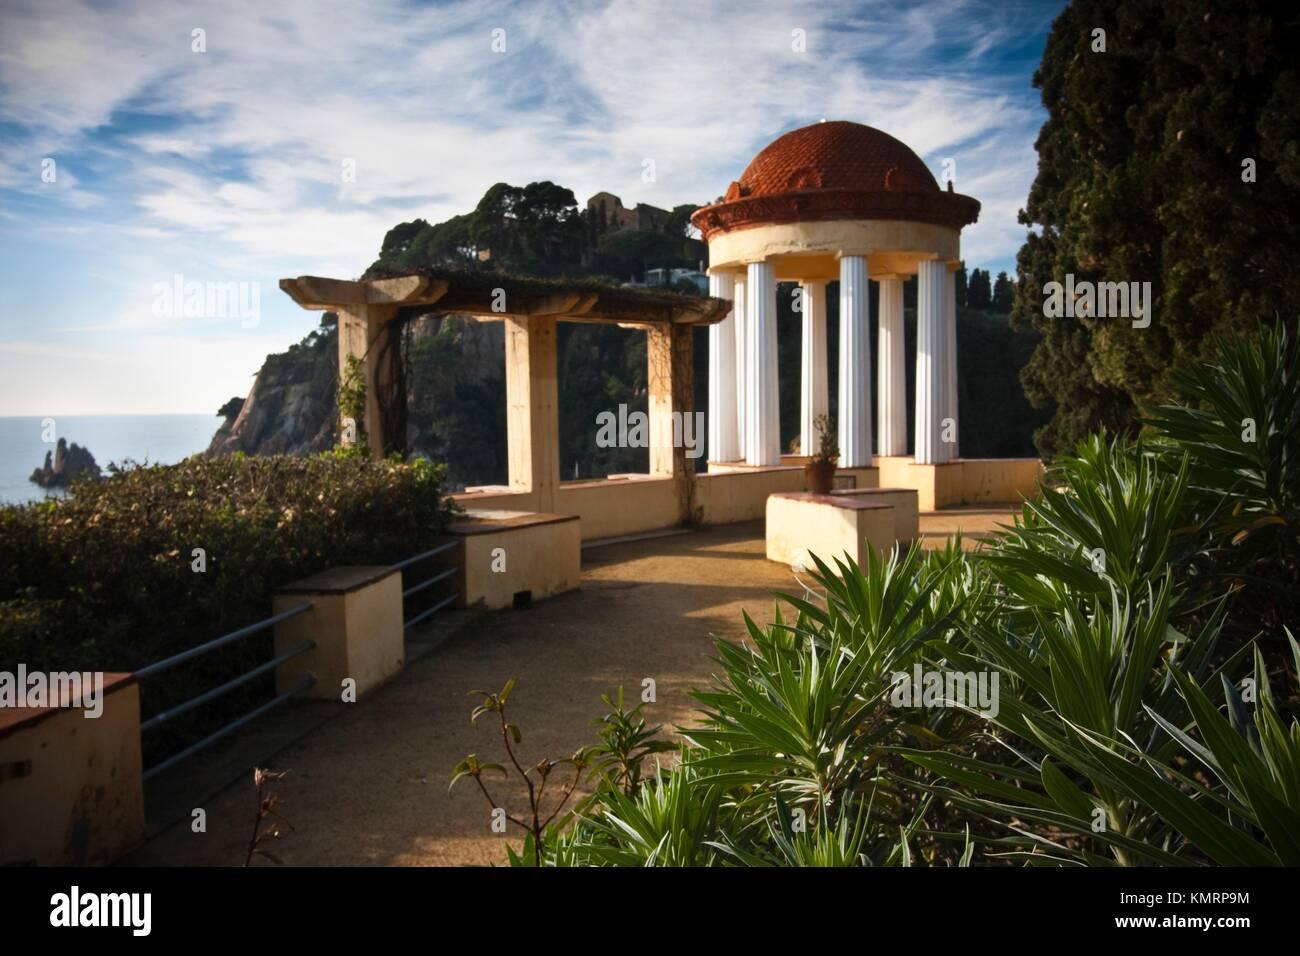 Templet de Linné Jardin Botánico Marimurtra Blanes Costa Brava ...